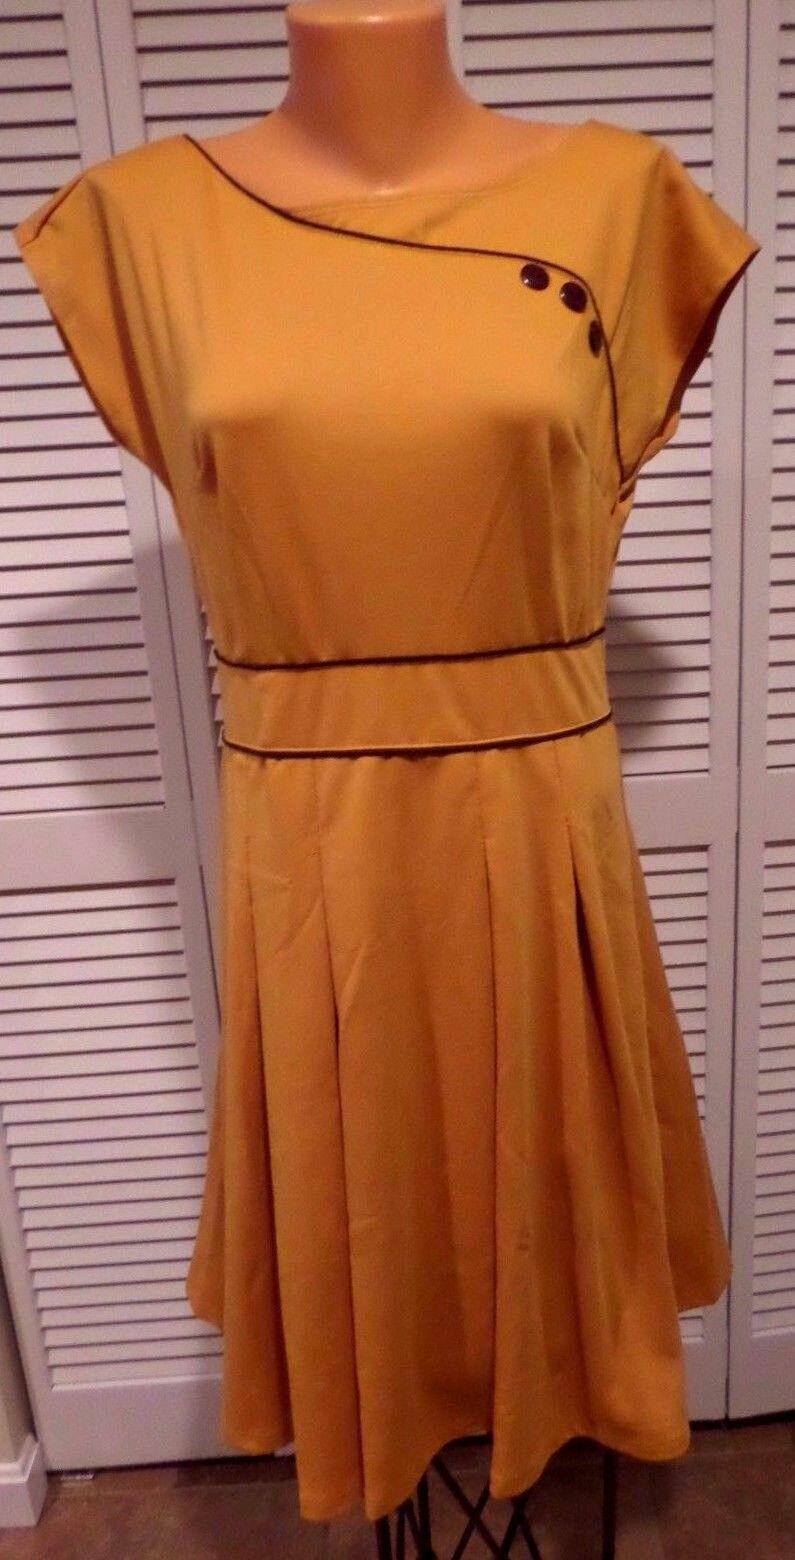 NWTD Retrolicious Topiary Tour Dress in Marigold Women's Dress Sz L